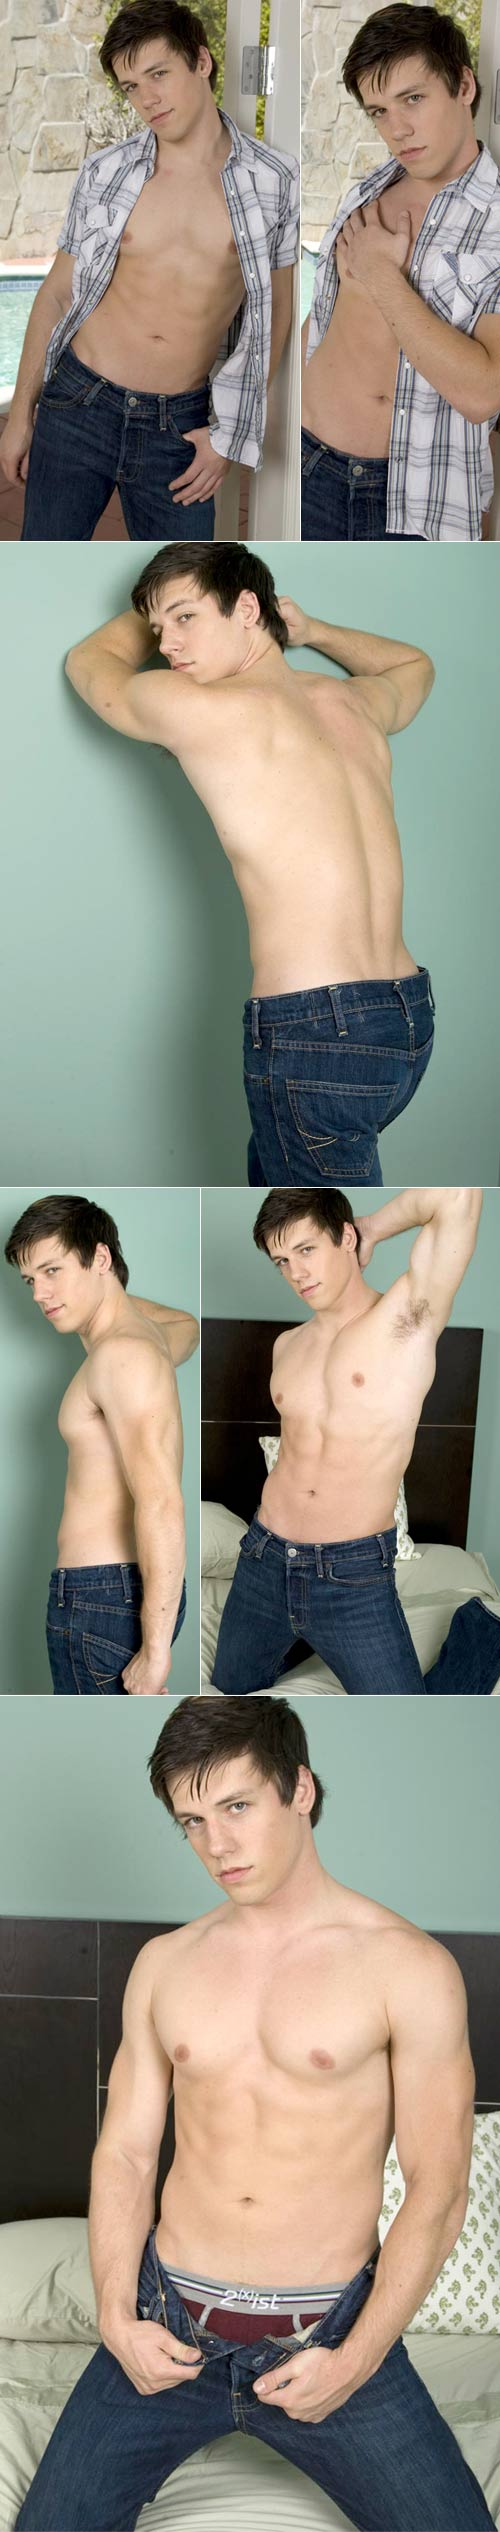 Cody Blackford at Randy Blue